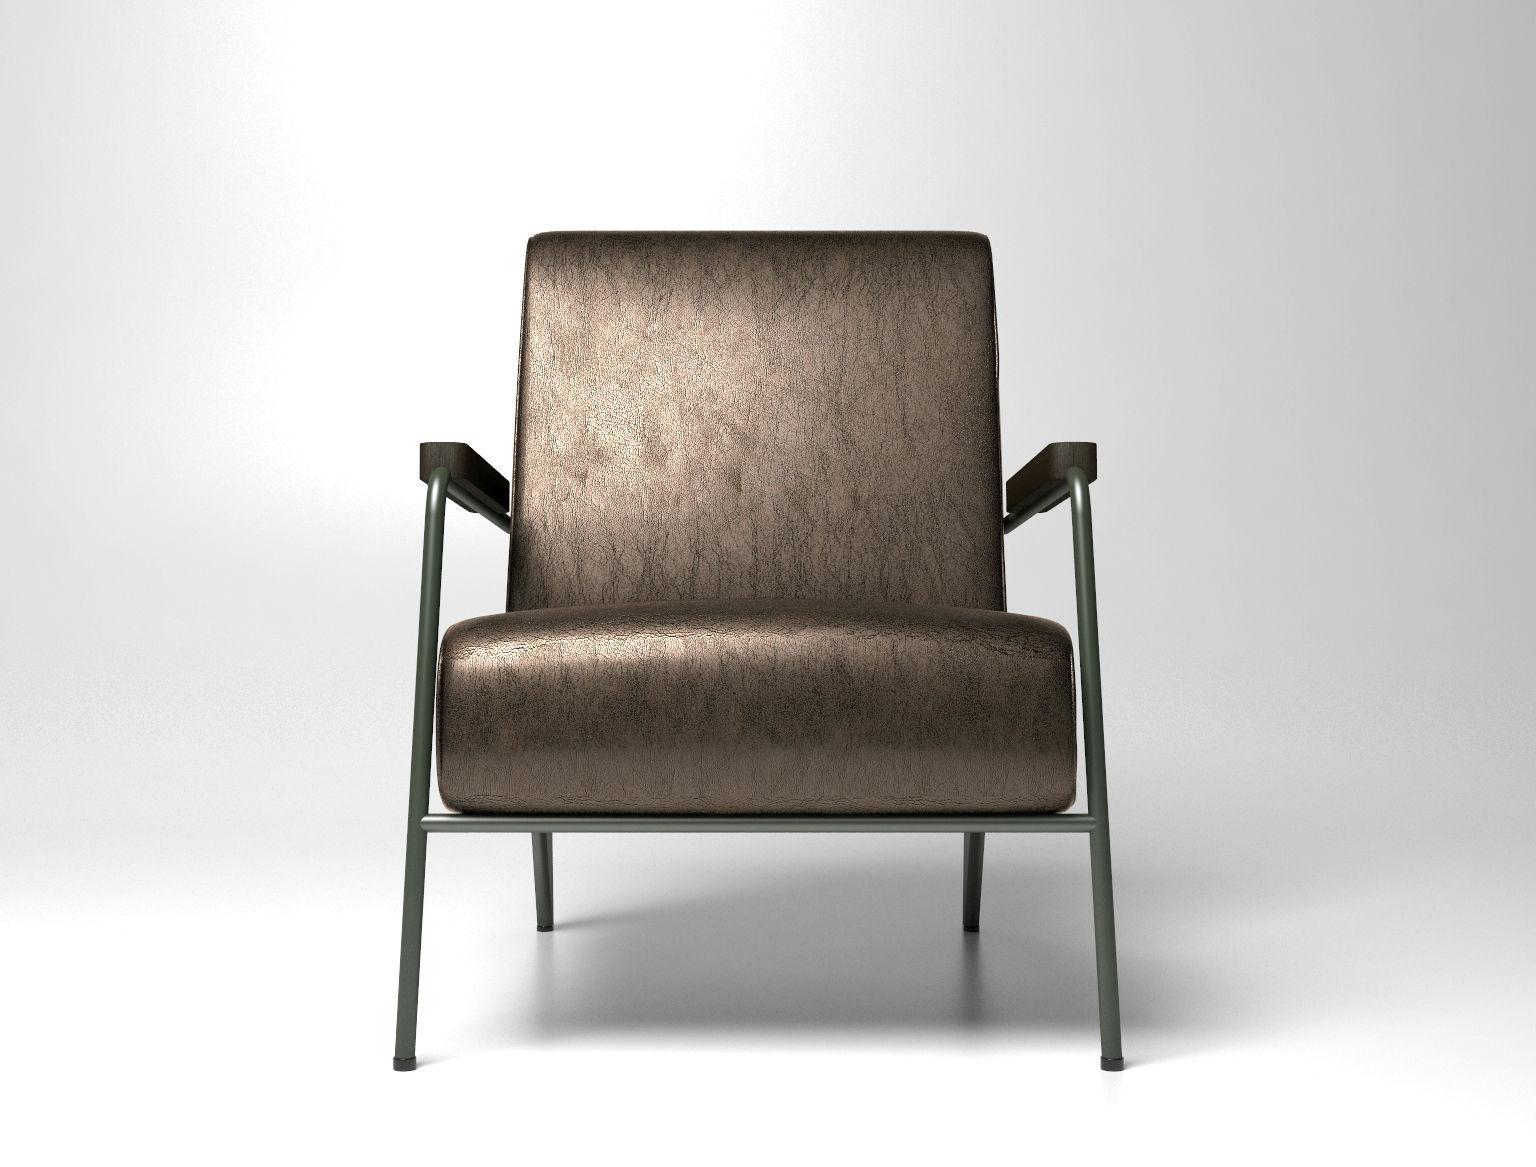 fauteuil de salon haut 3d model max obj. Black Bedroom Furniture Sets. Home Design Ideas